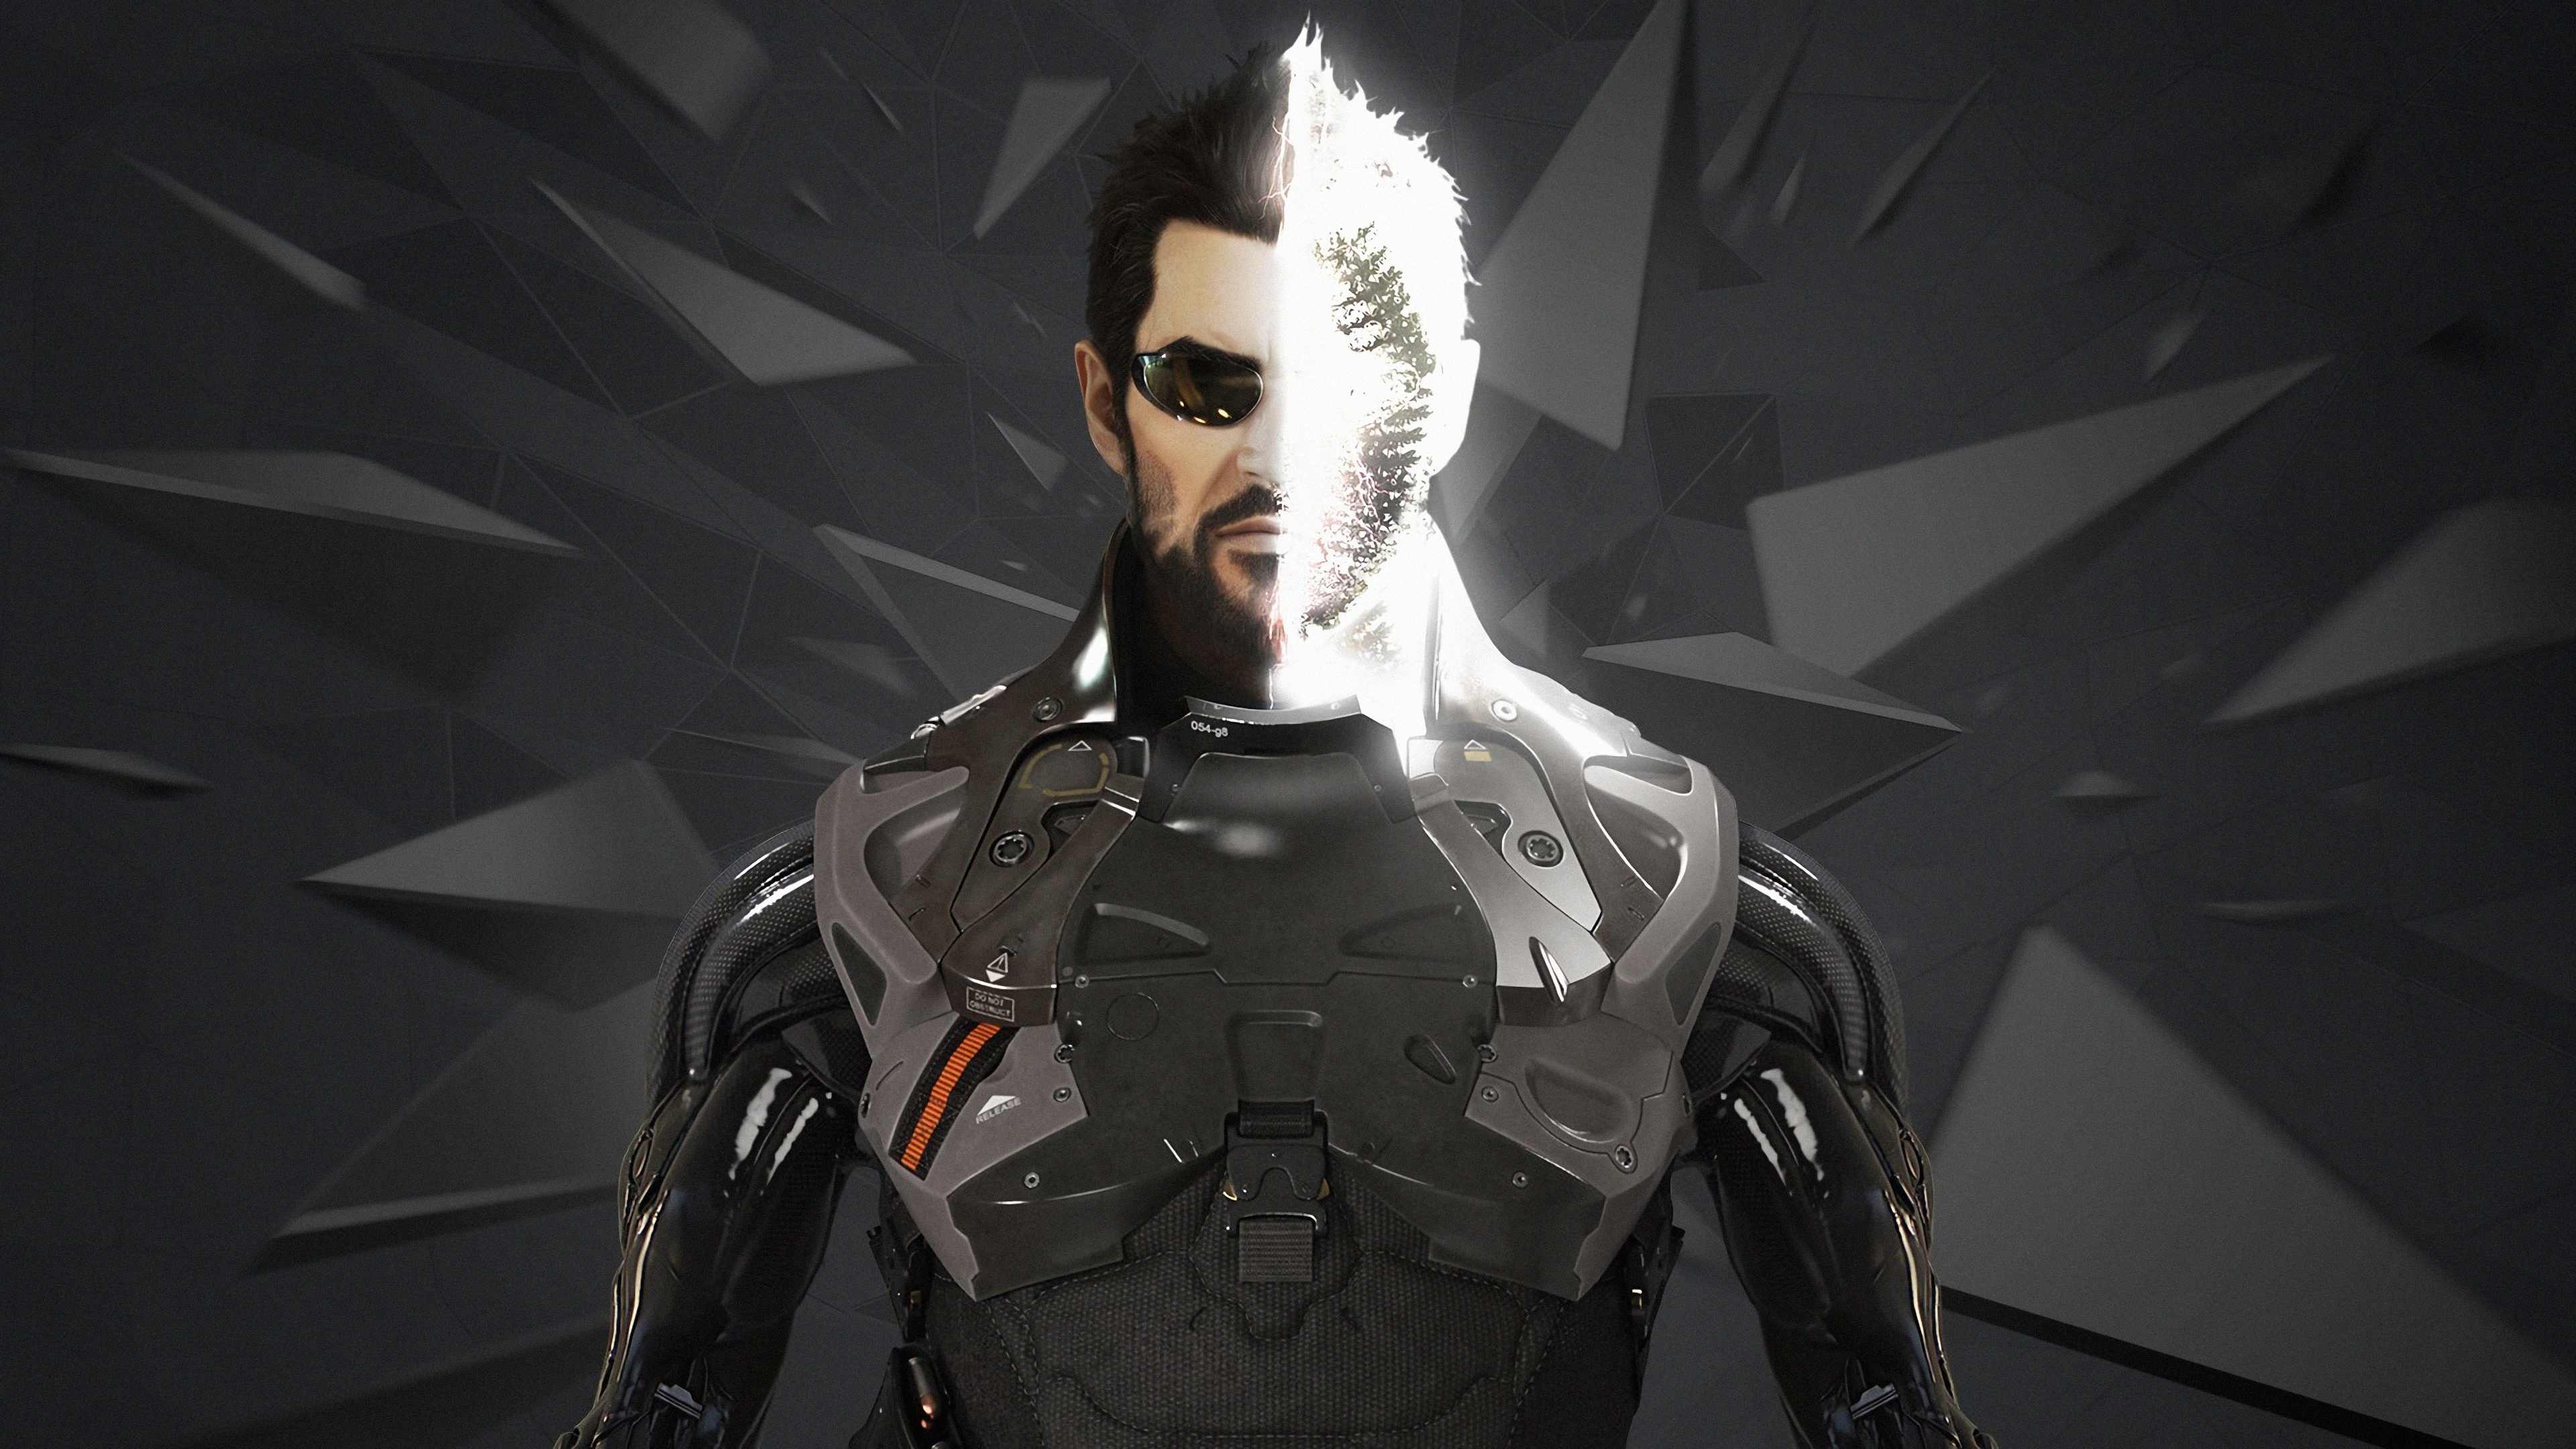 Wallpaper 4k Deus Ex Mankind Video Game 4k Wallpapers Deus Ex